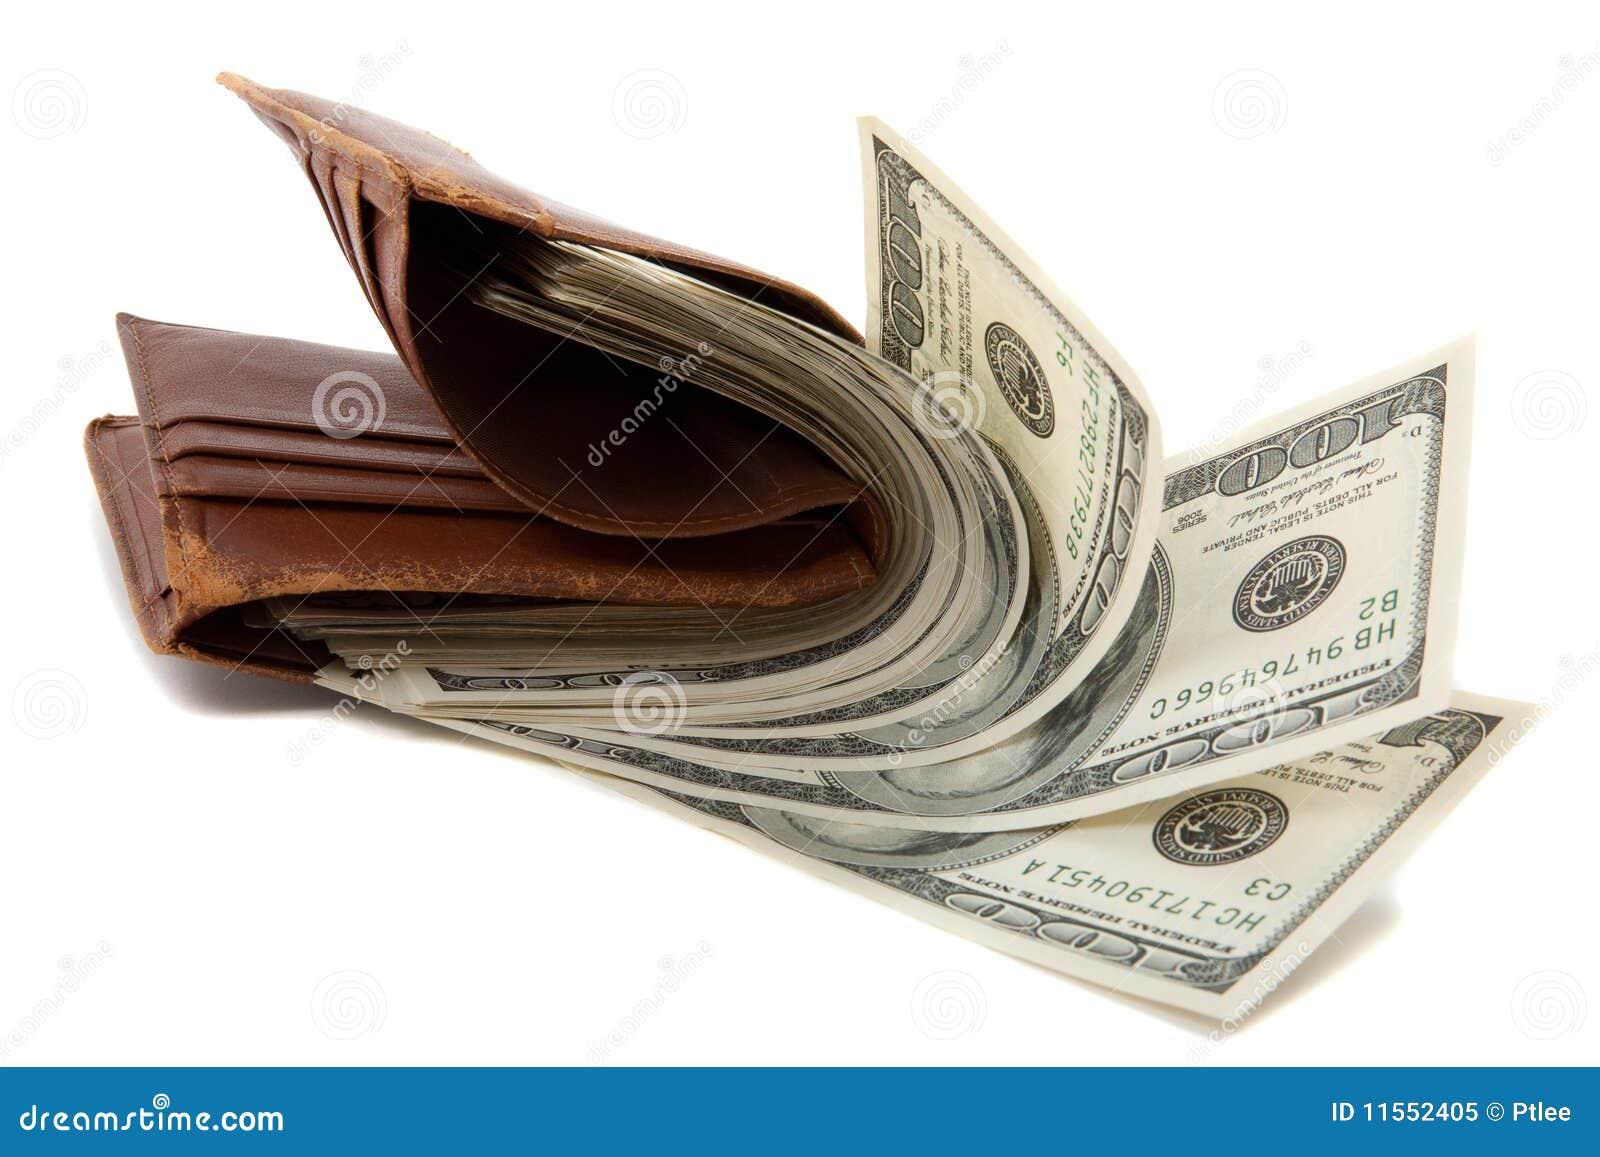 Beautiful Wallet Design